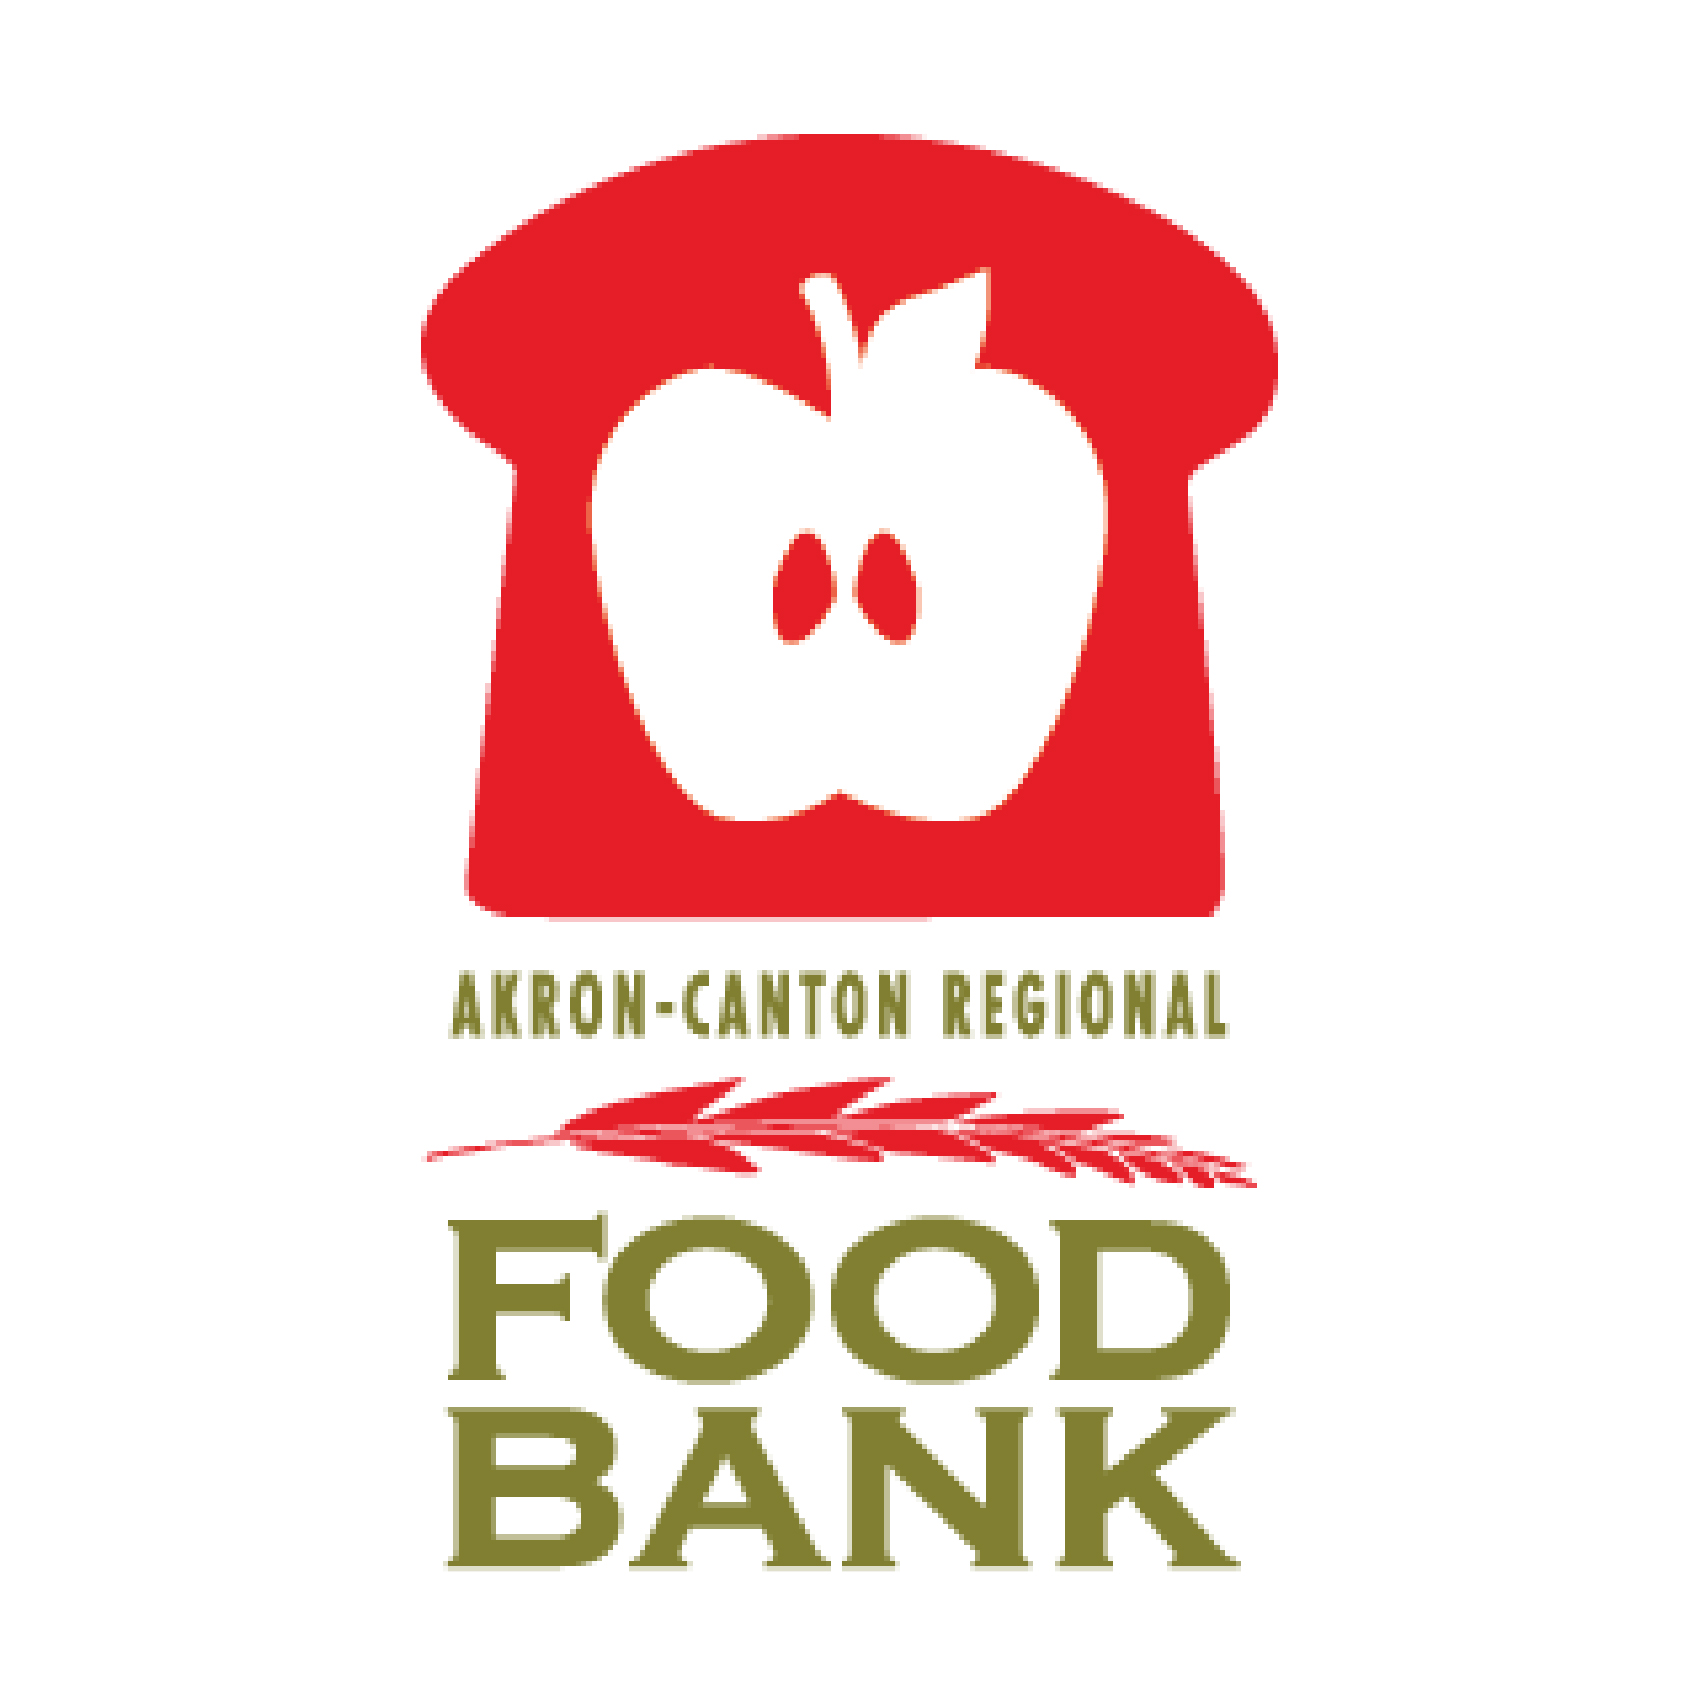 Akron Canton Regional Food Bank